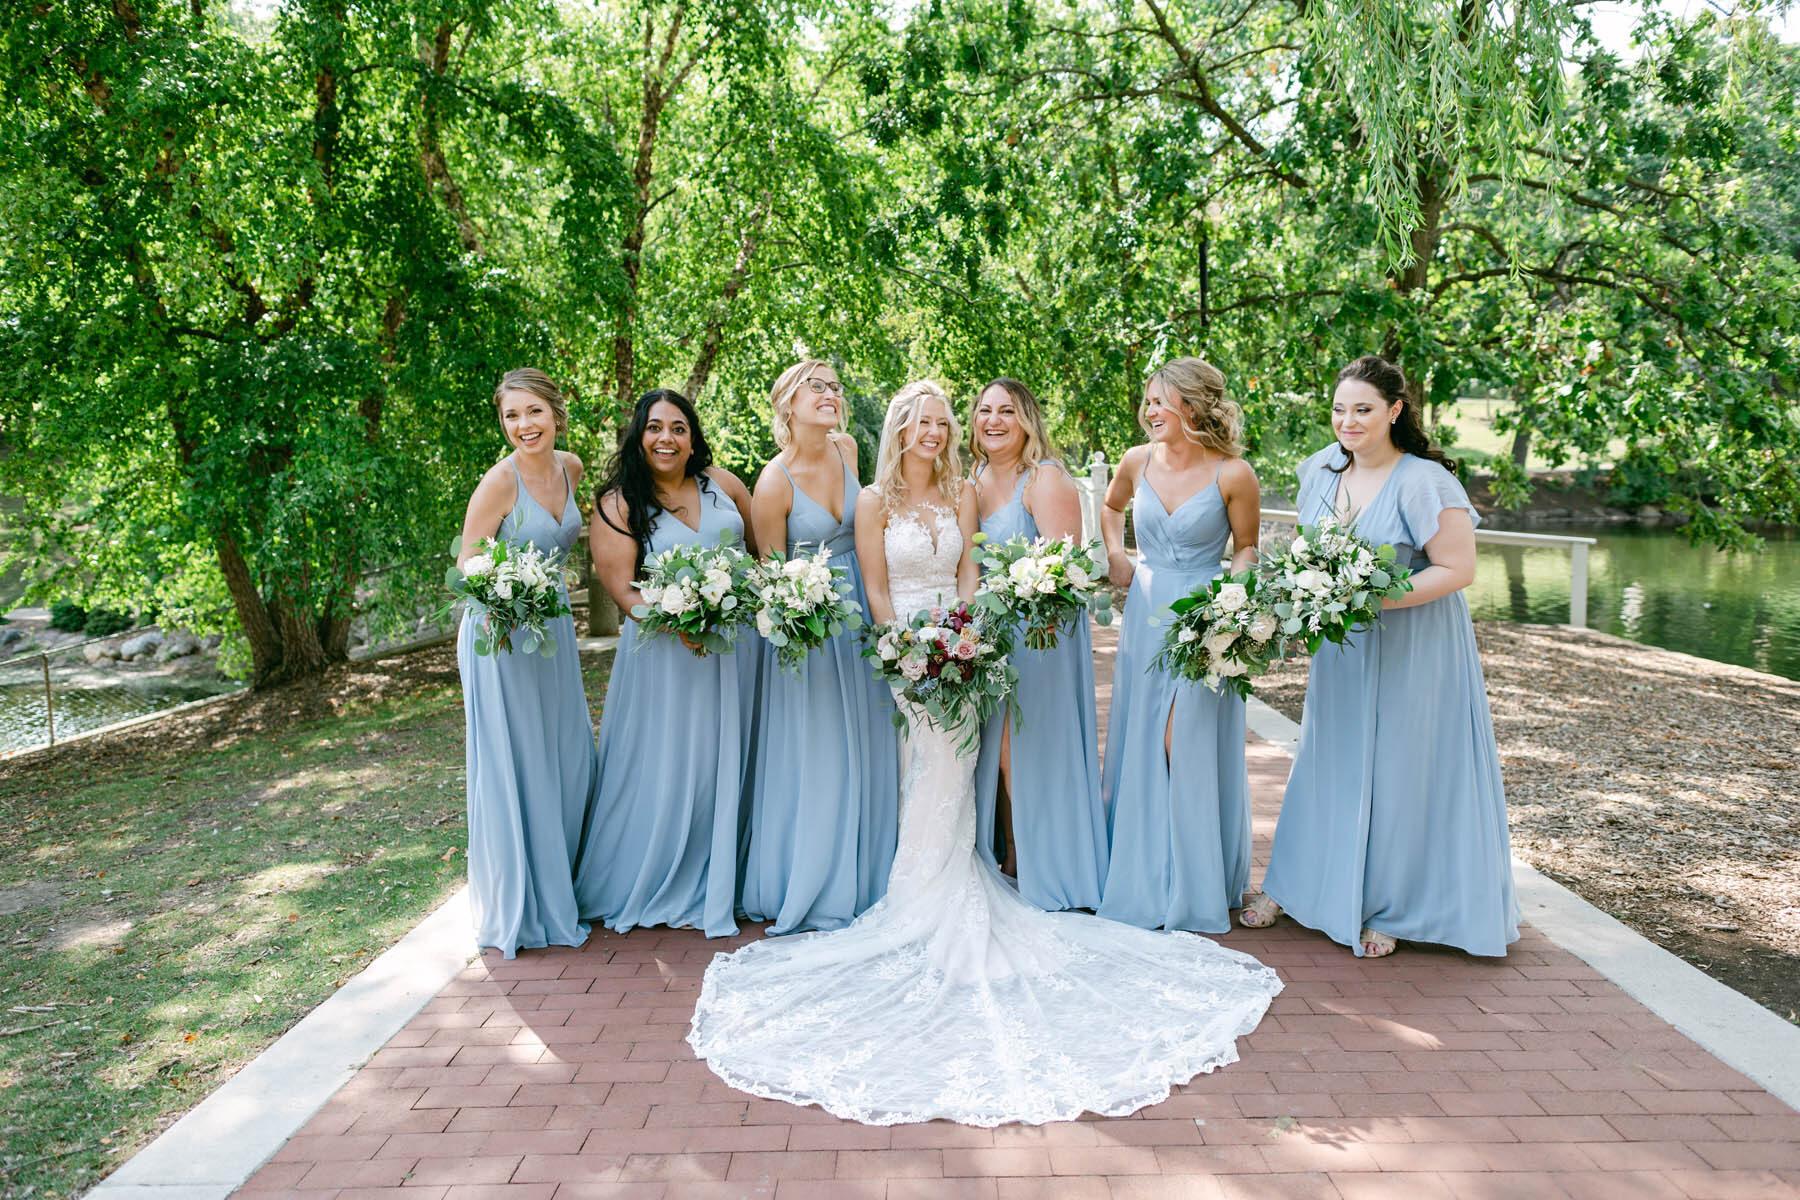 Lord's Park wedding bridesmaids